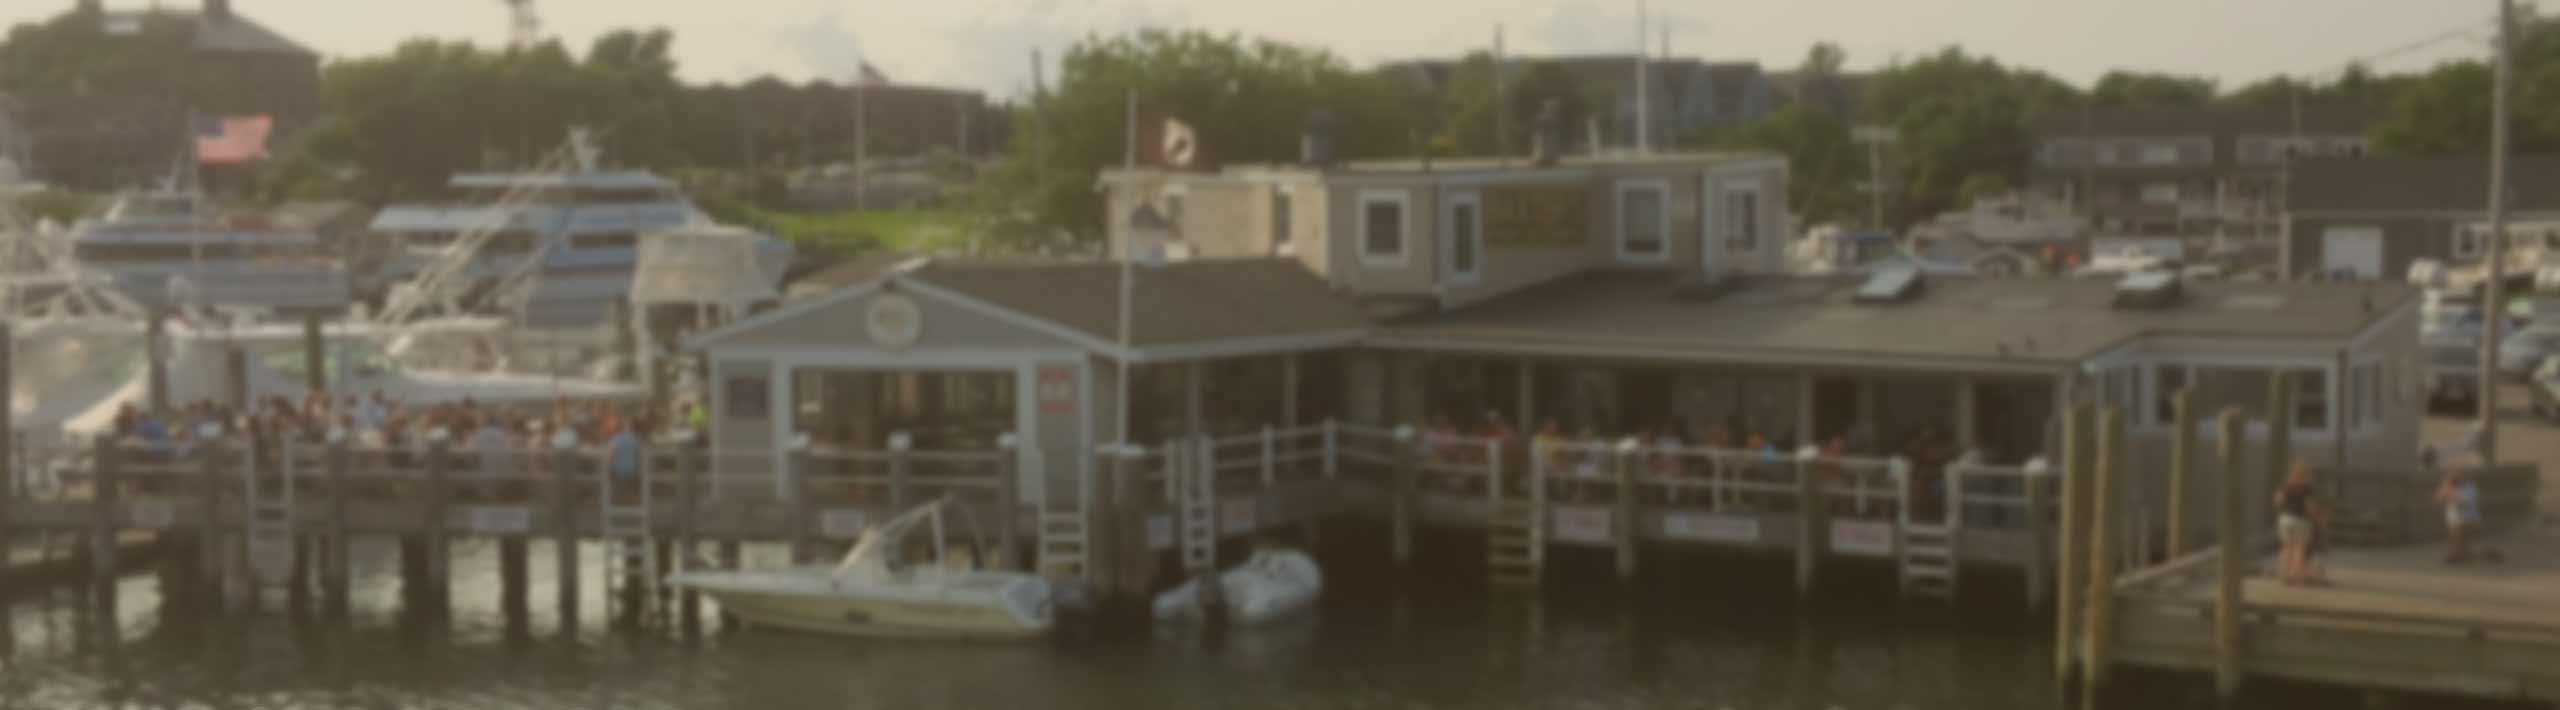 Baxter 39 S Boathouse Club Baxter 39 S Boathouse Hyannis MA 02601